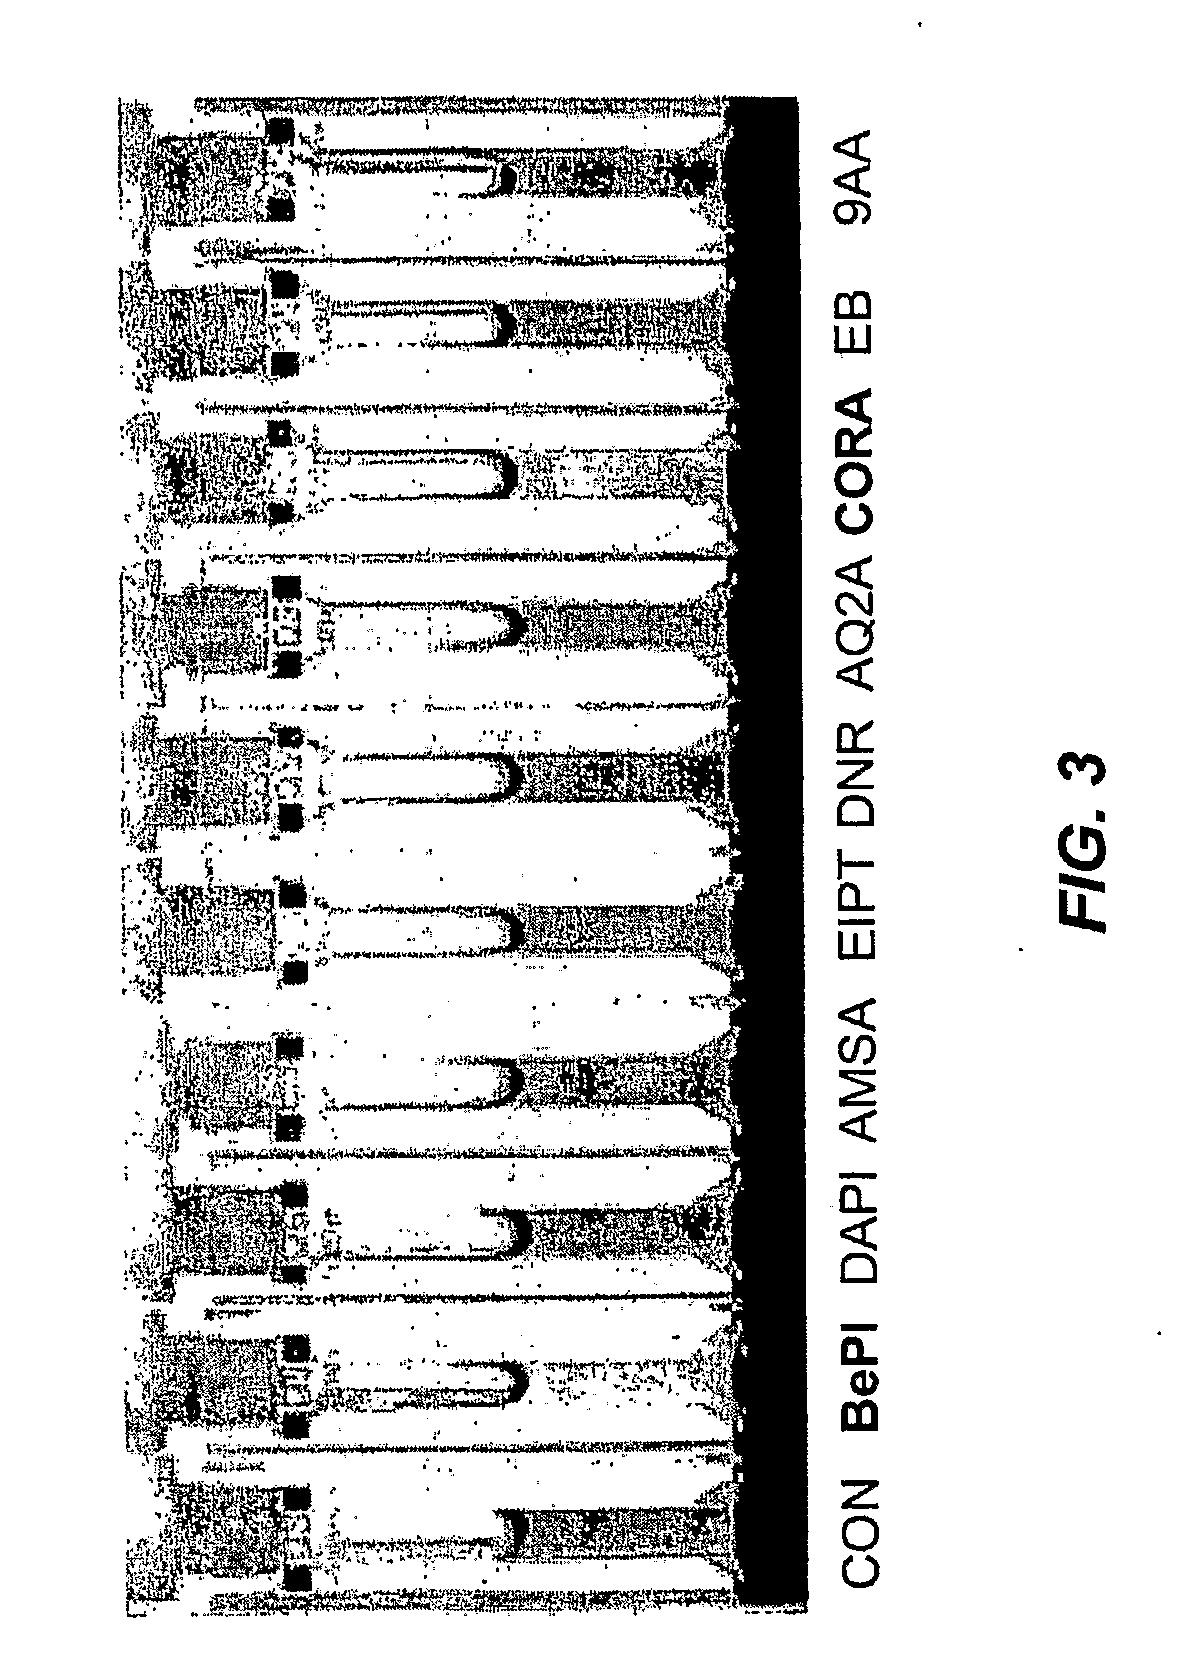 US20090221095A1 - Colorimetric Screening of DNA Binding